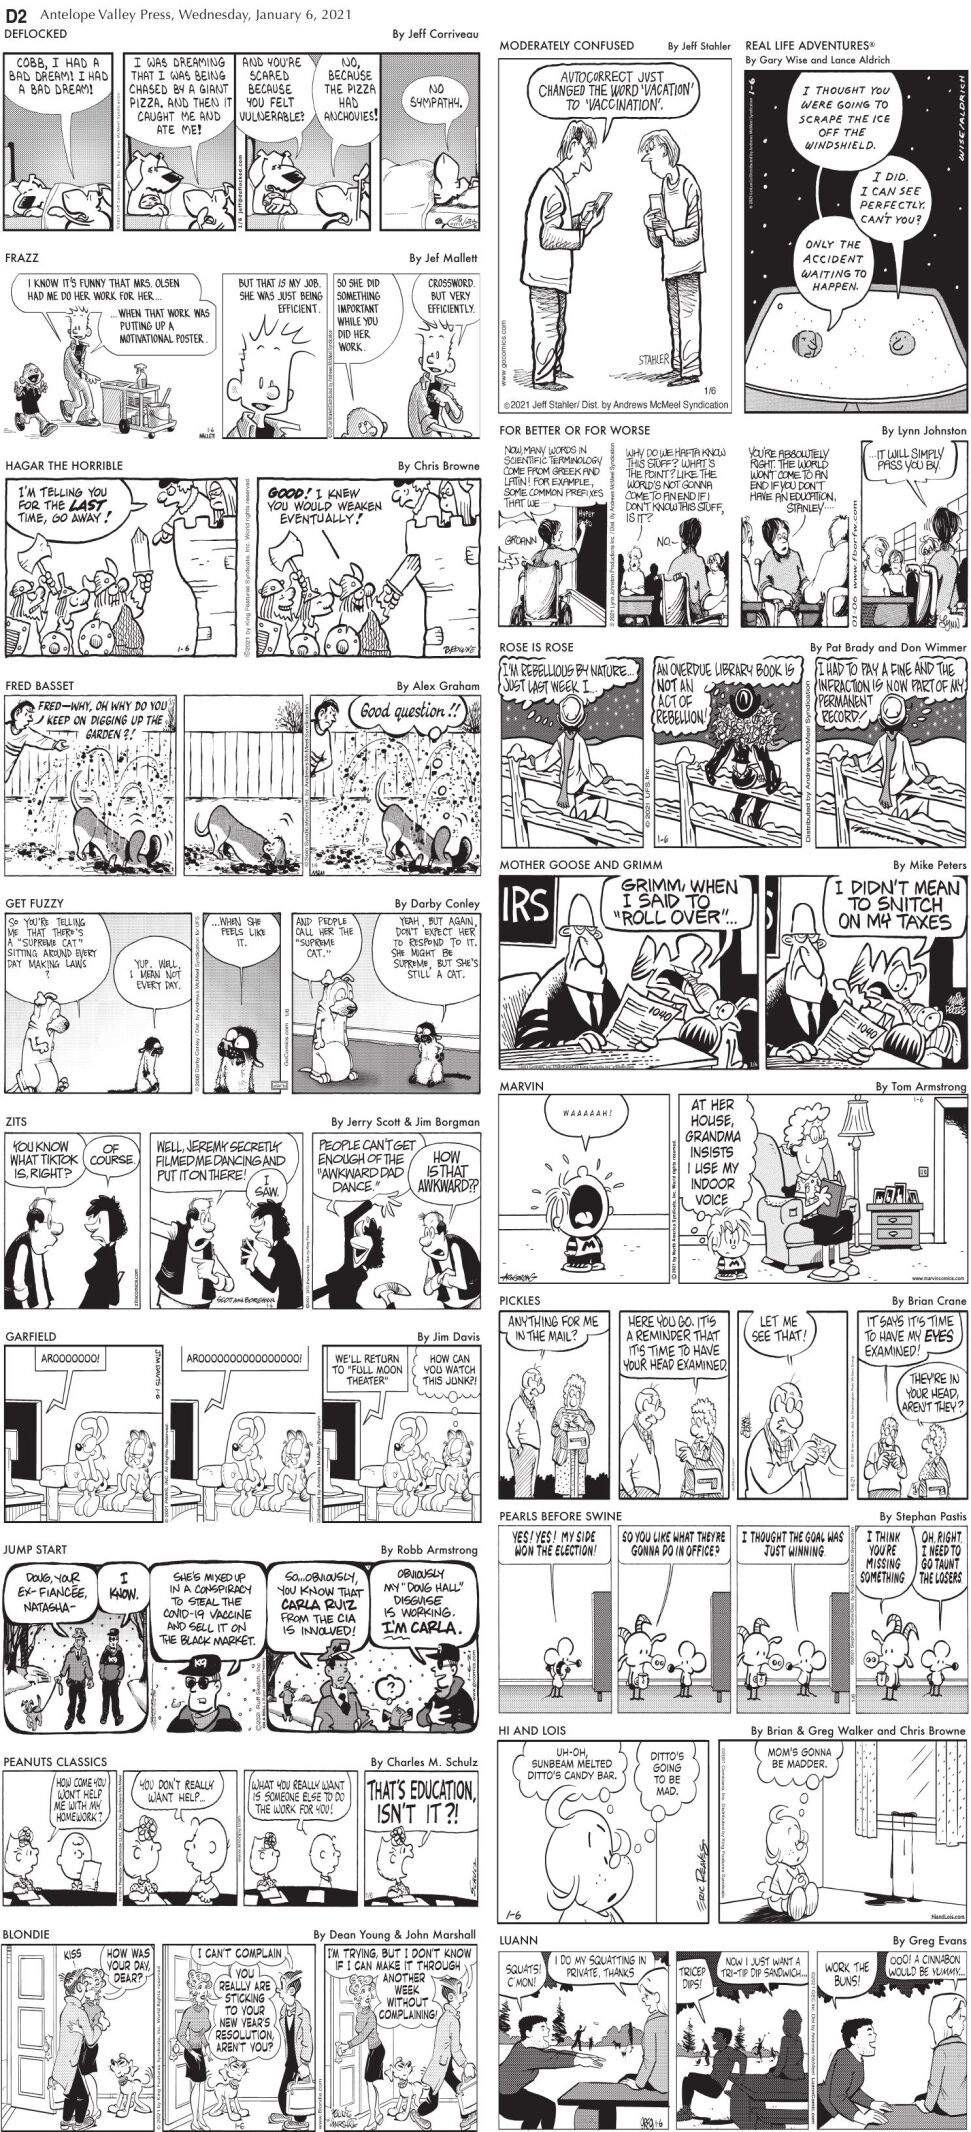 Comics, Jan. 6, 2020